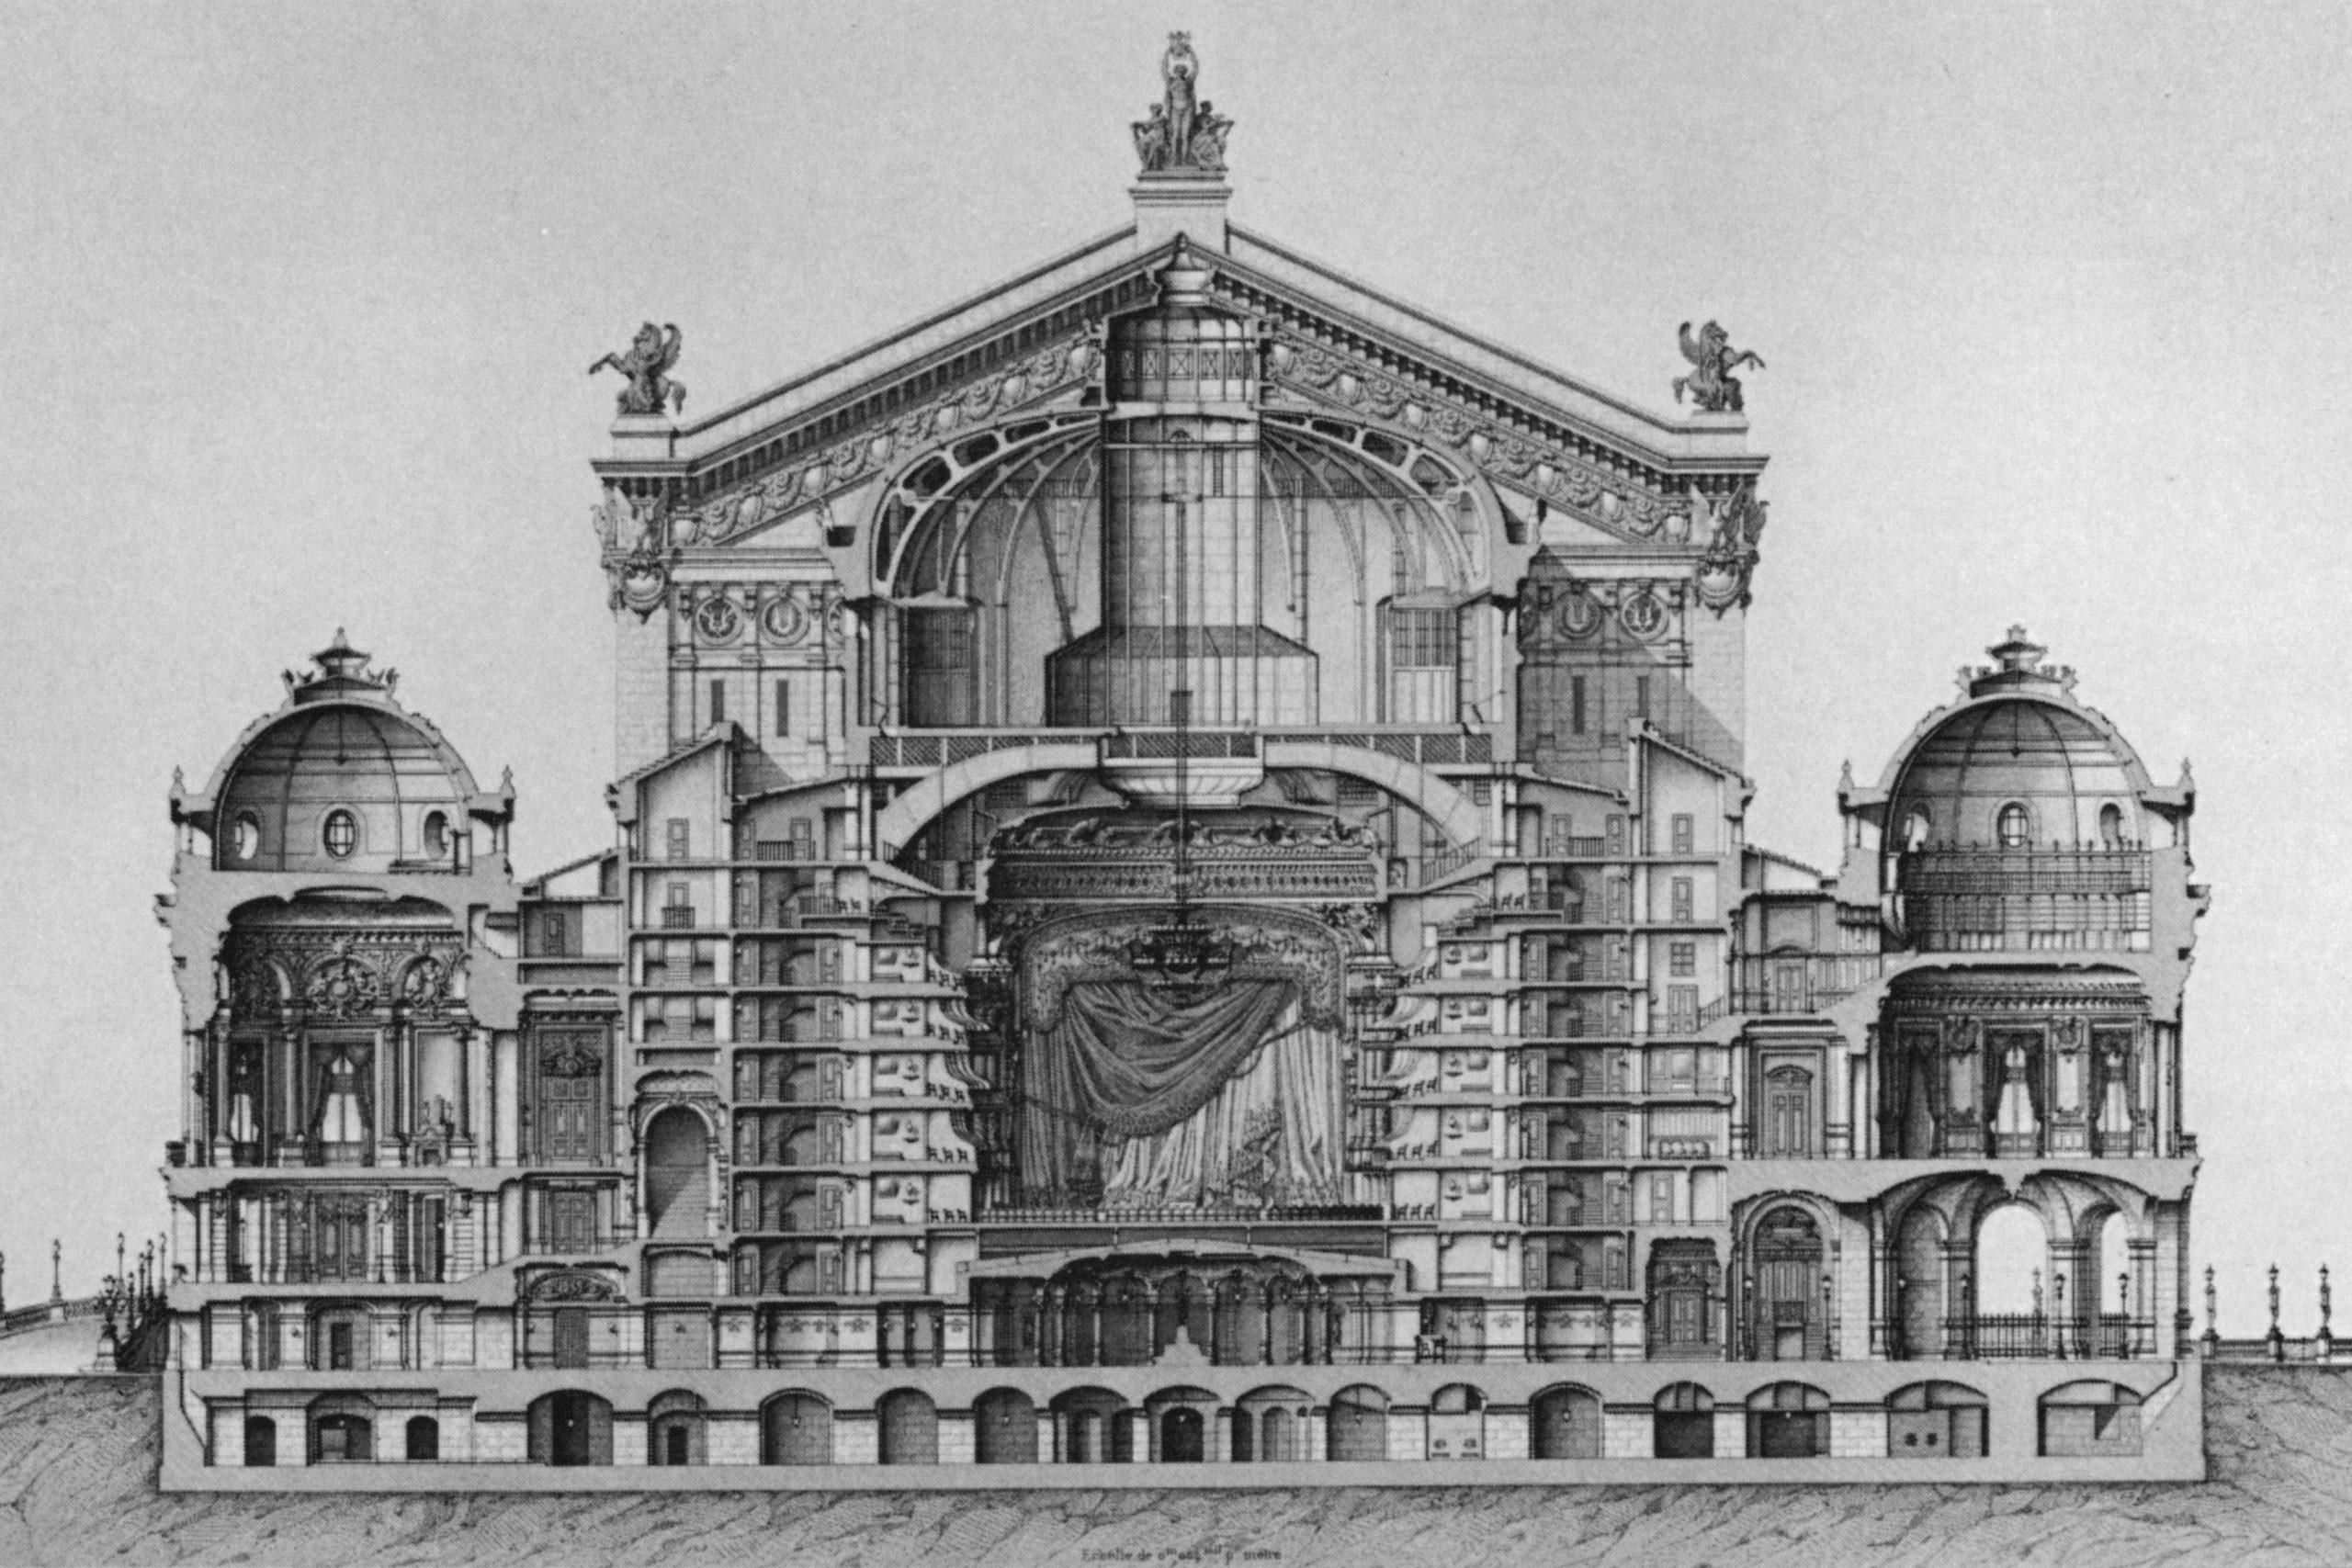 Transverse section at the auditorium and pavilions of the Paris Opera's Palais Garnier